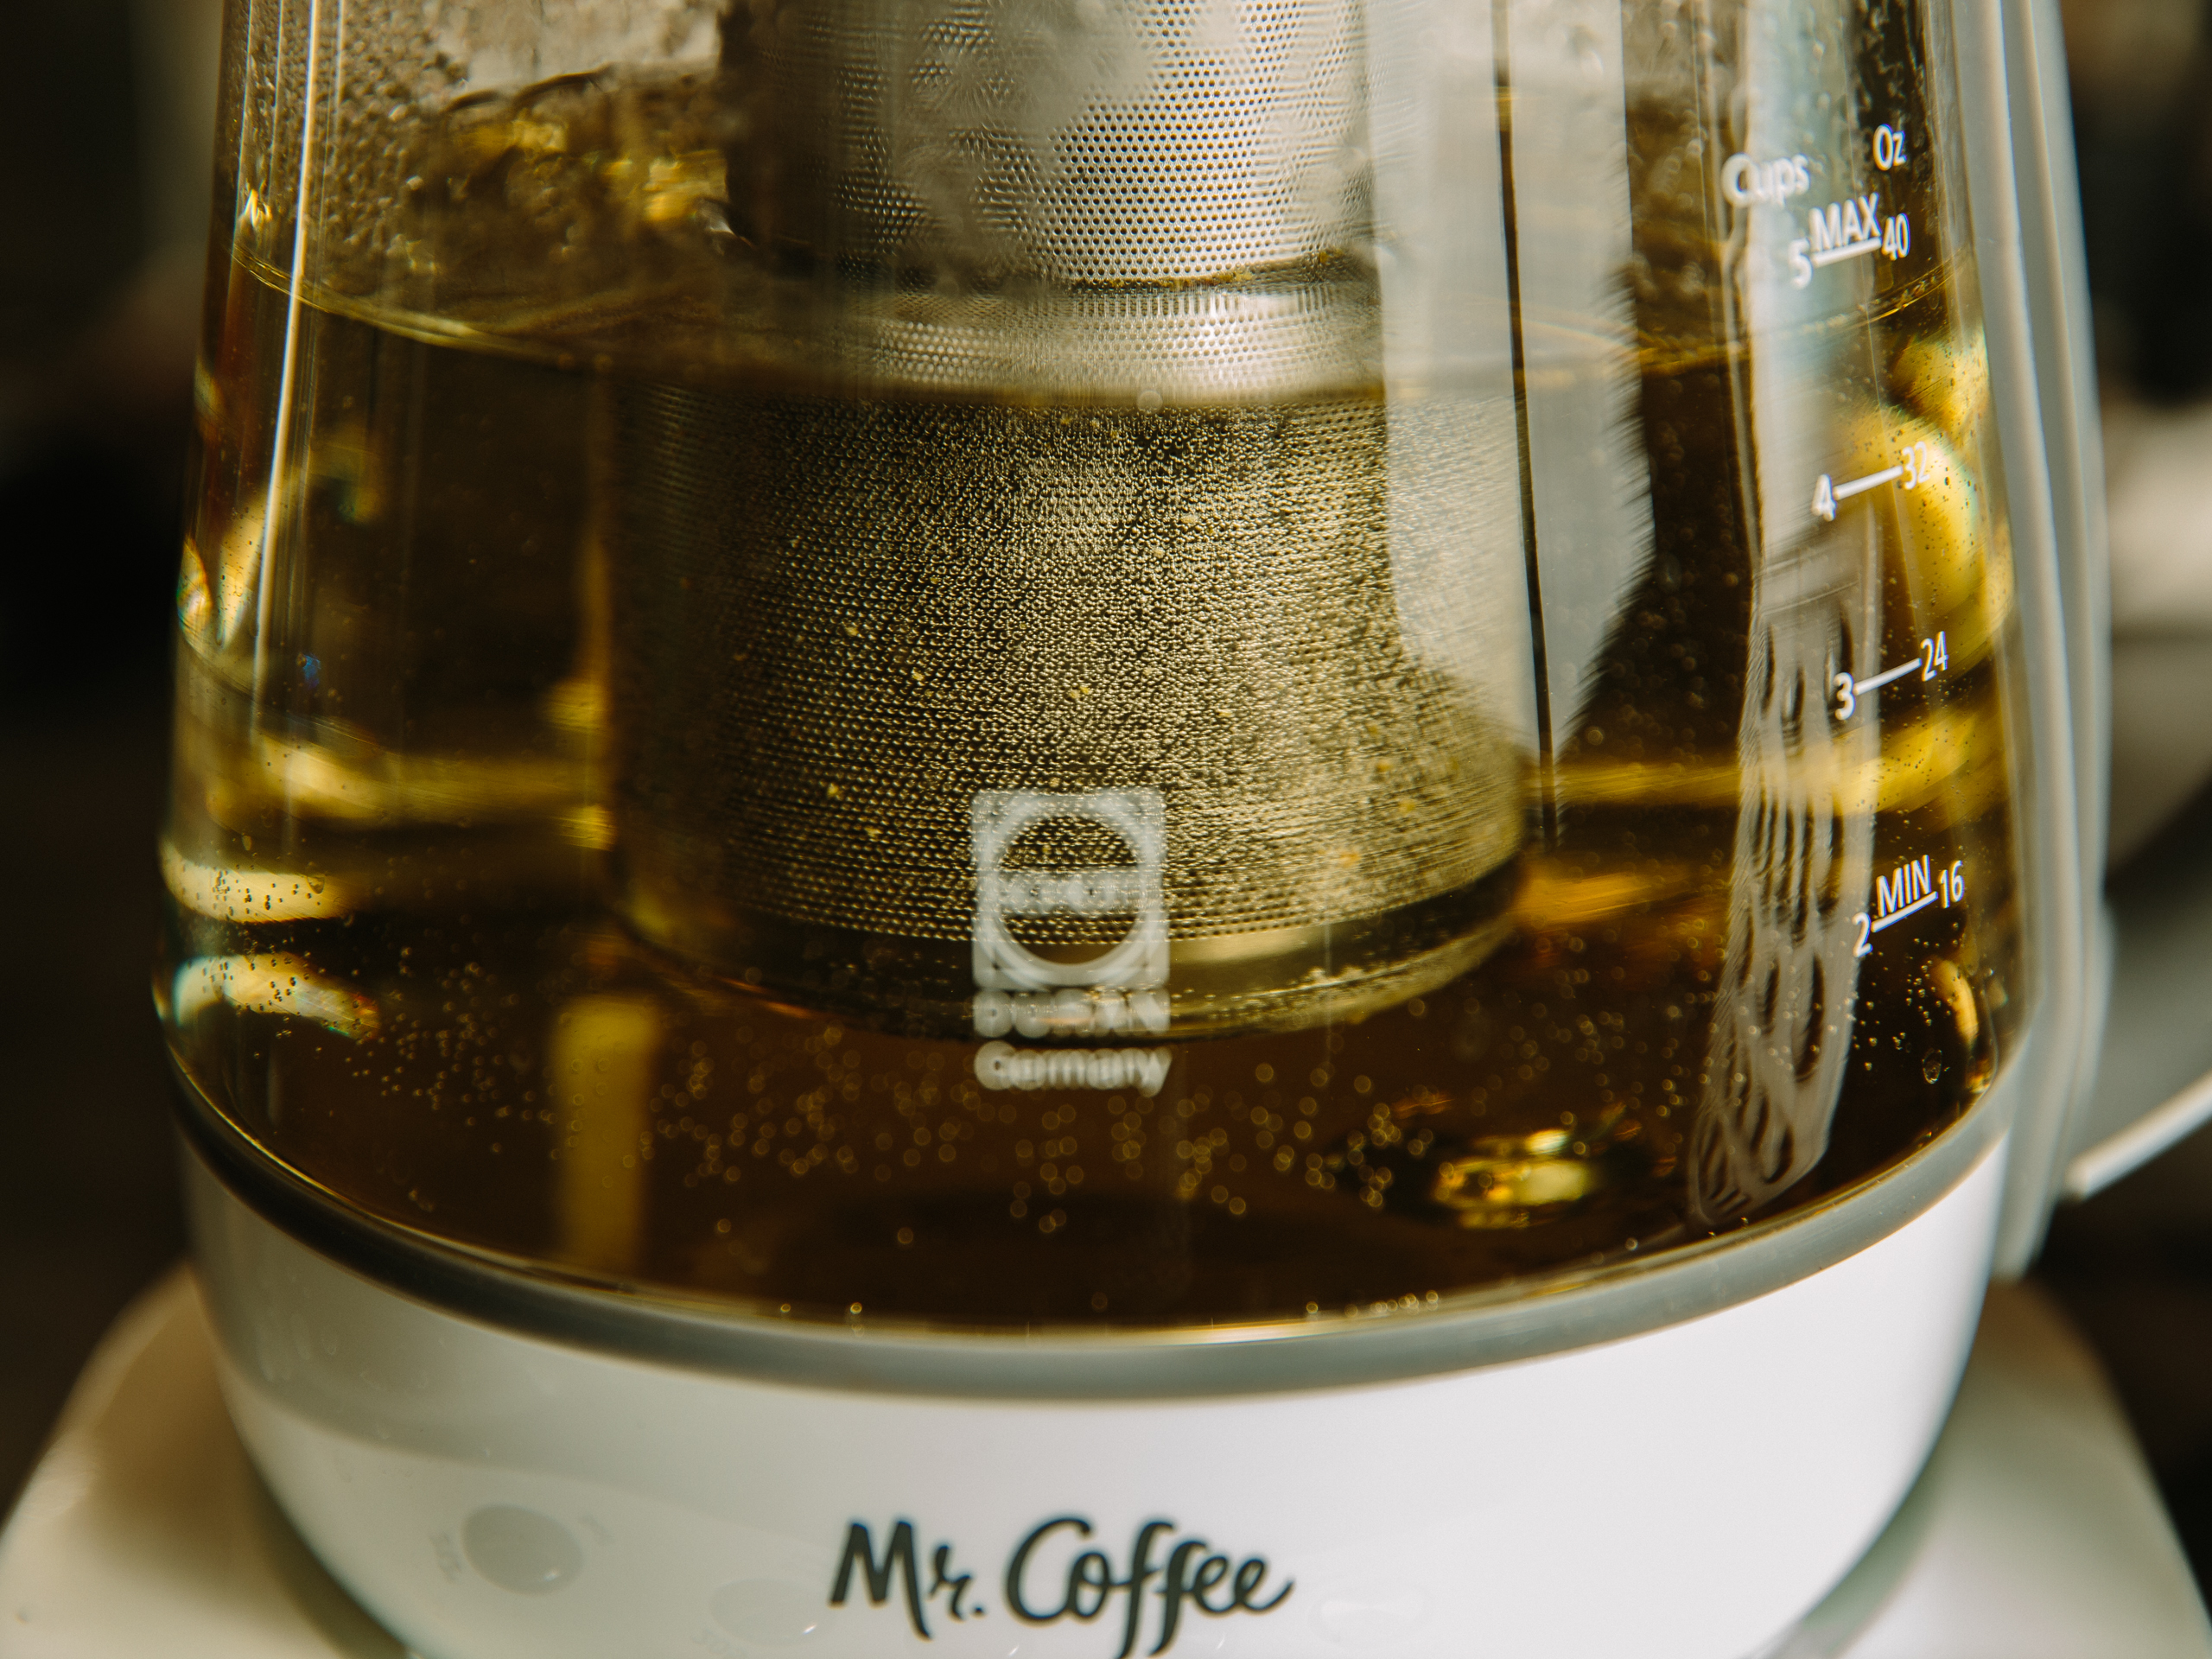 mr-coffee-tea-maker-product-photos-1.jpg